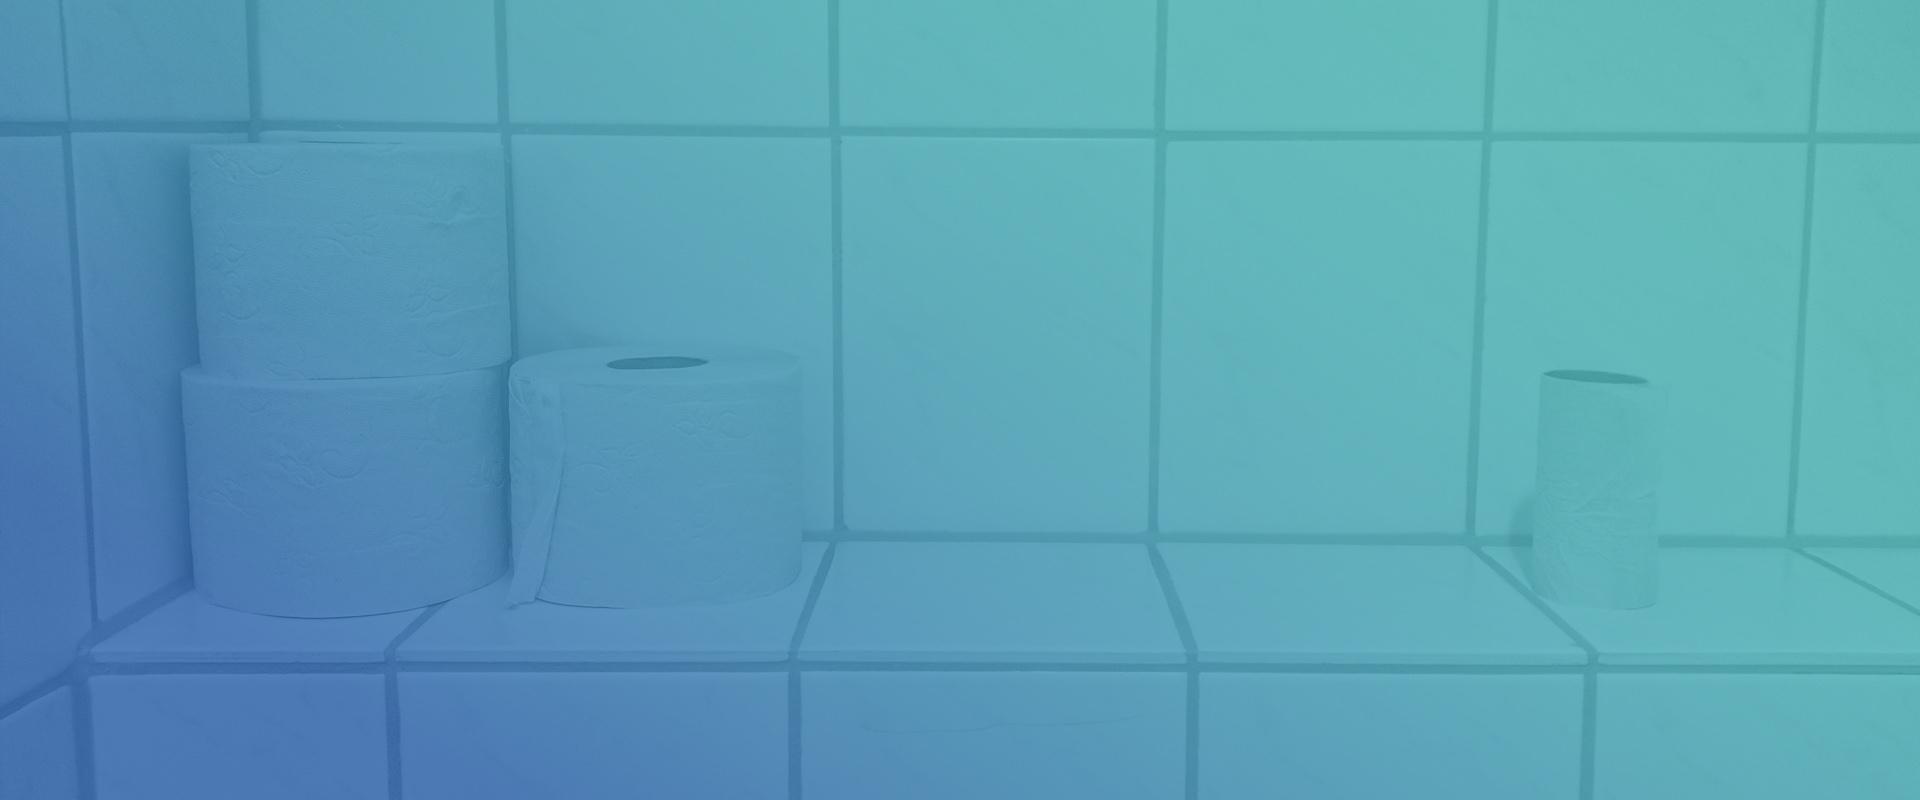 HSG-Washroom-Services-—-Paper-Products.jpg#asset:2273